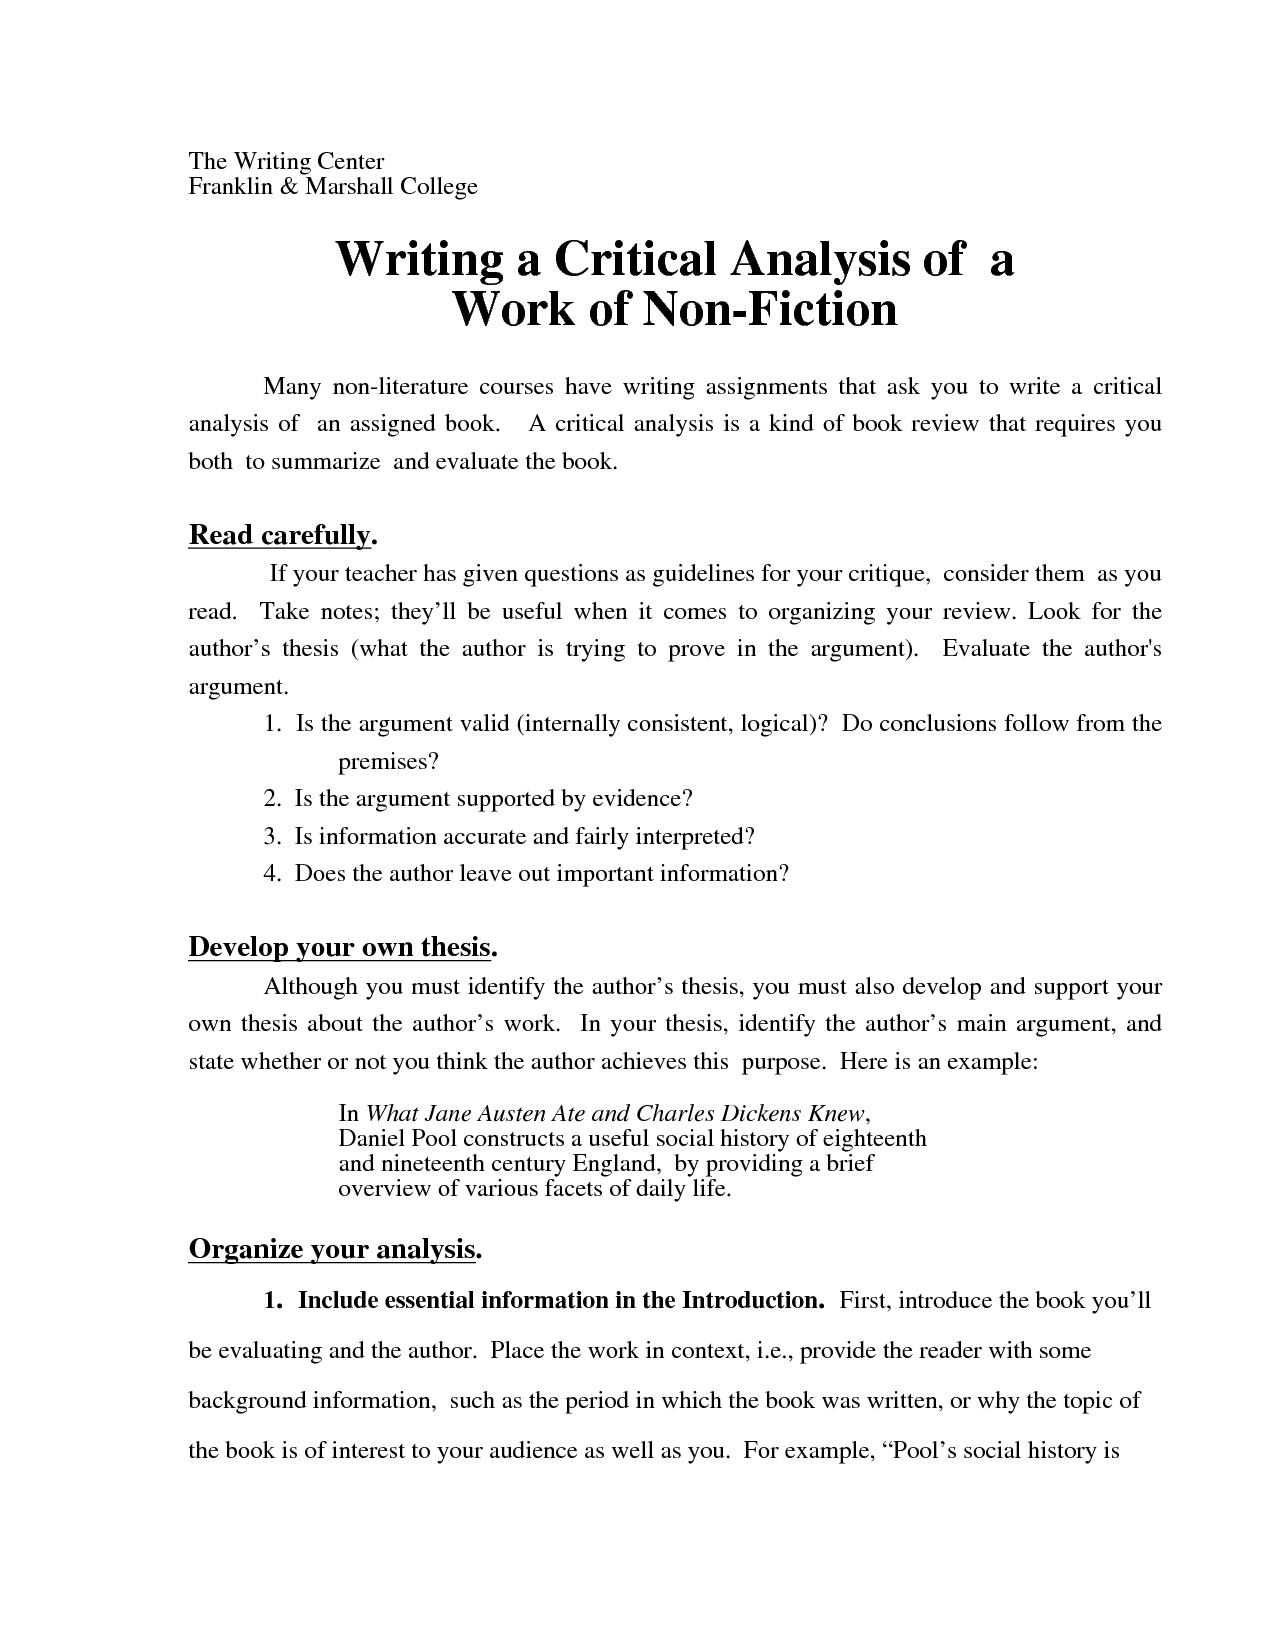 003 Essay Example Nurse Research Papers Vanderbilt Reliable